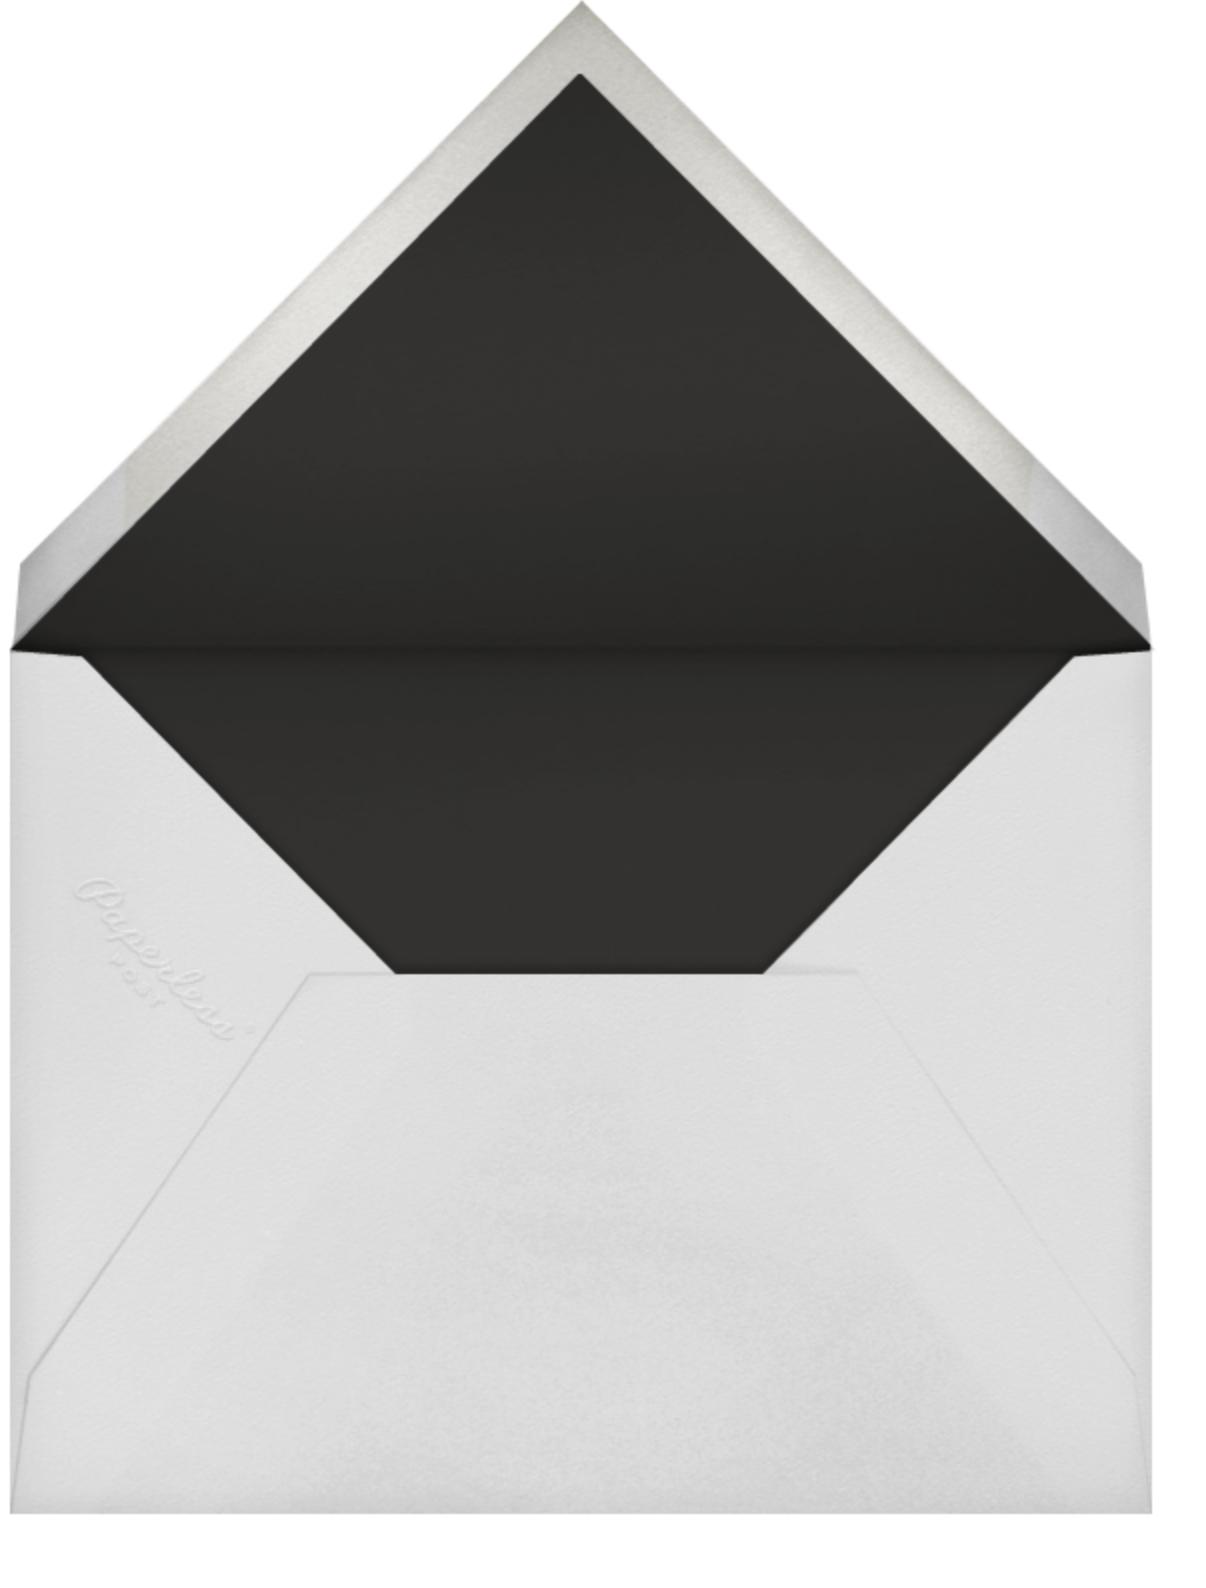 Floral Trellis II (Stationery) - Gold - Oscar de la Renta - Personalized stationery - envelope back